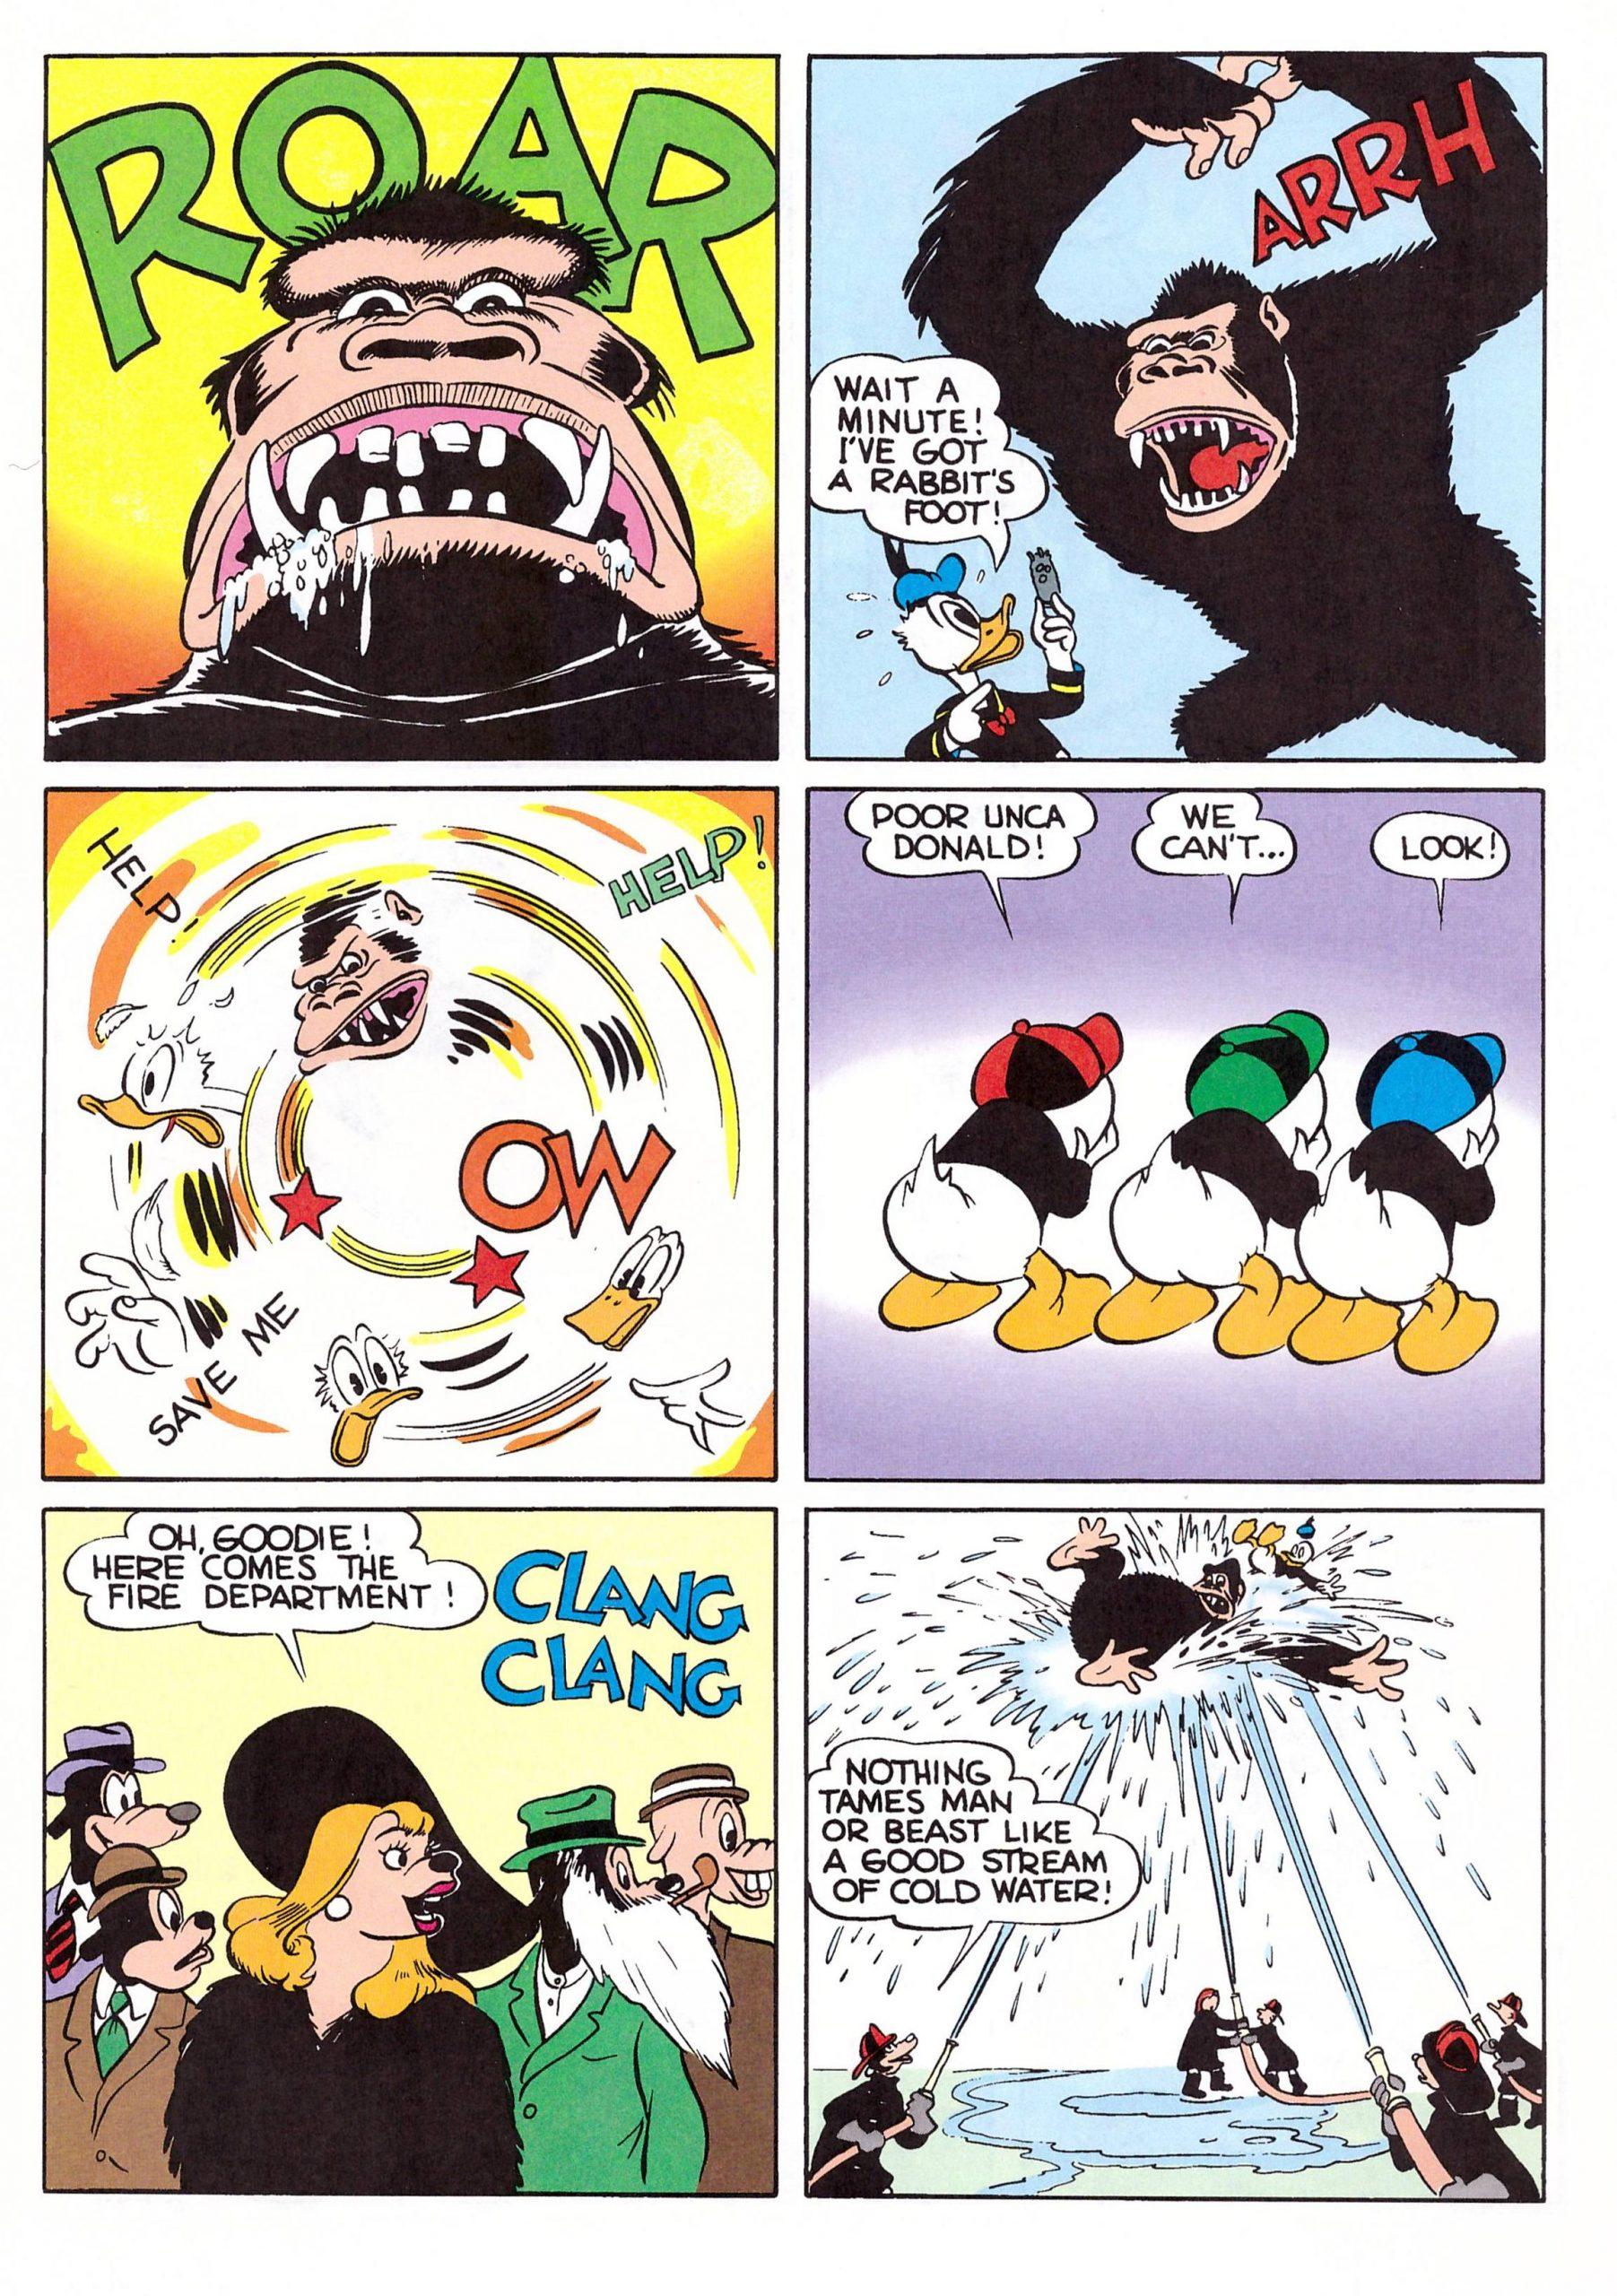 Walt Disney Comics & Stories by Carl Barks 1 review